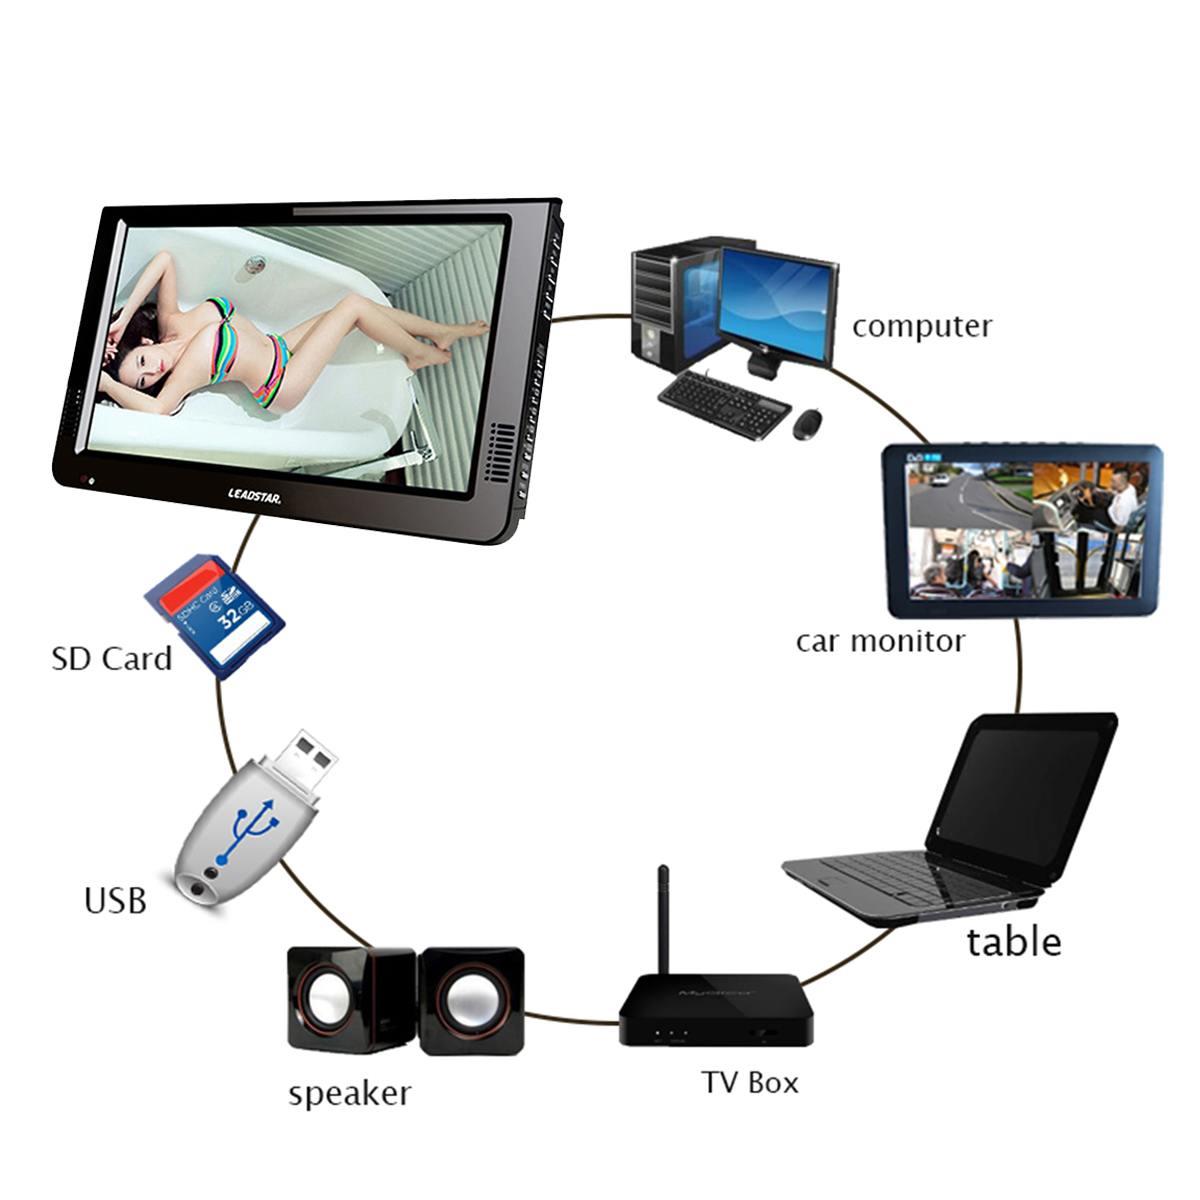 Outdoor 10,2 Inch 12V Tragbare Digital Analog Fernsehen DVB T/DVB T2 TFT LED HD TV Unterstützung TF Karte USB audio Auto Fernsehen - 4